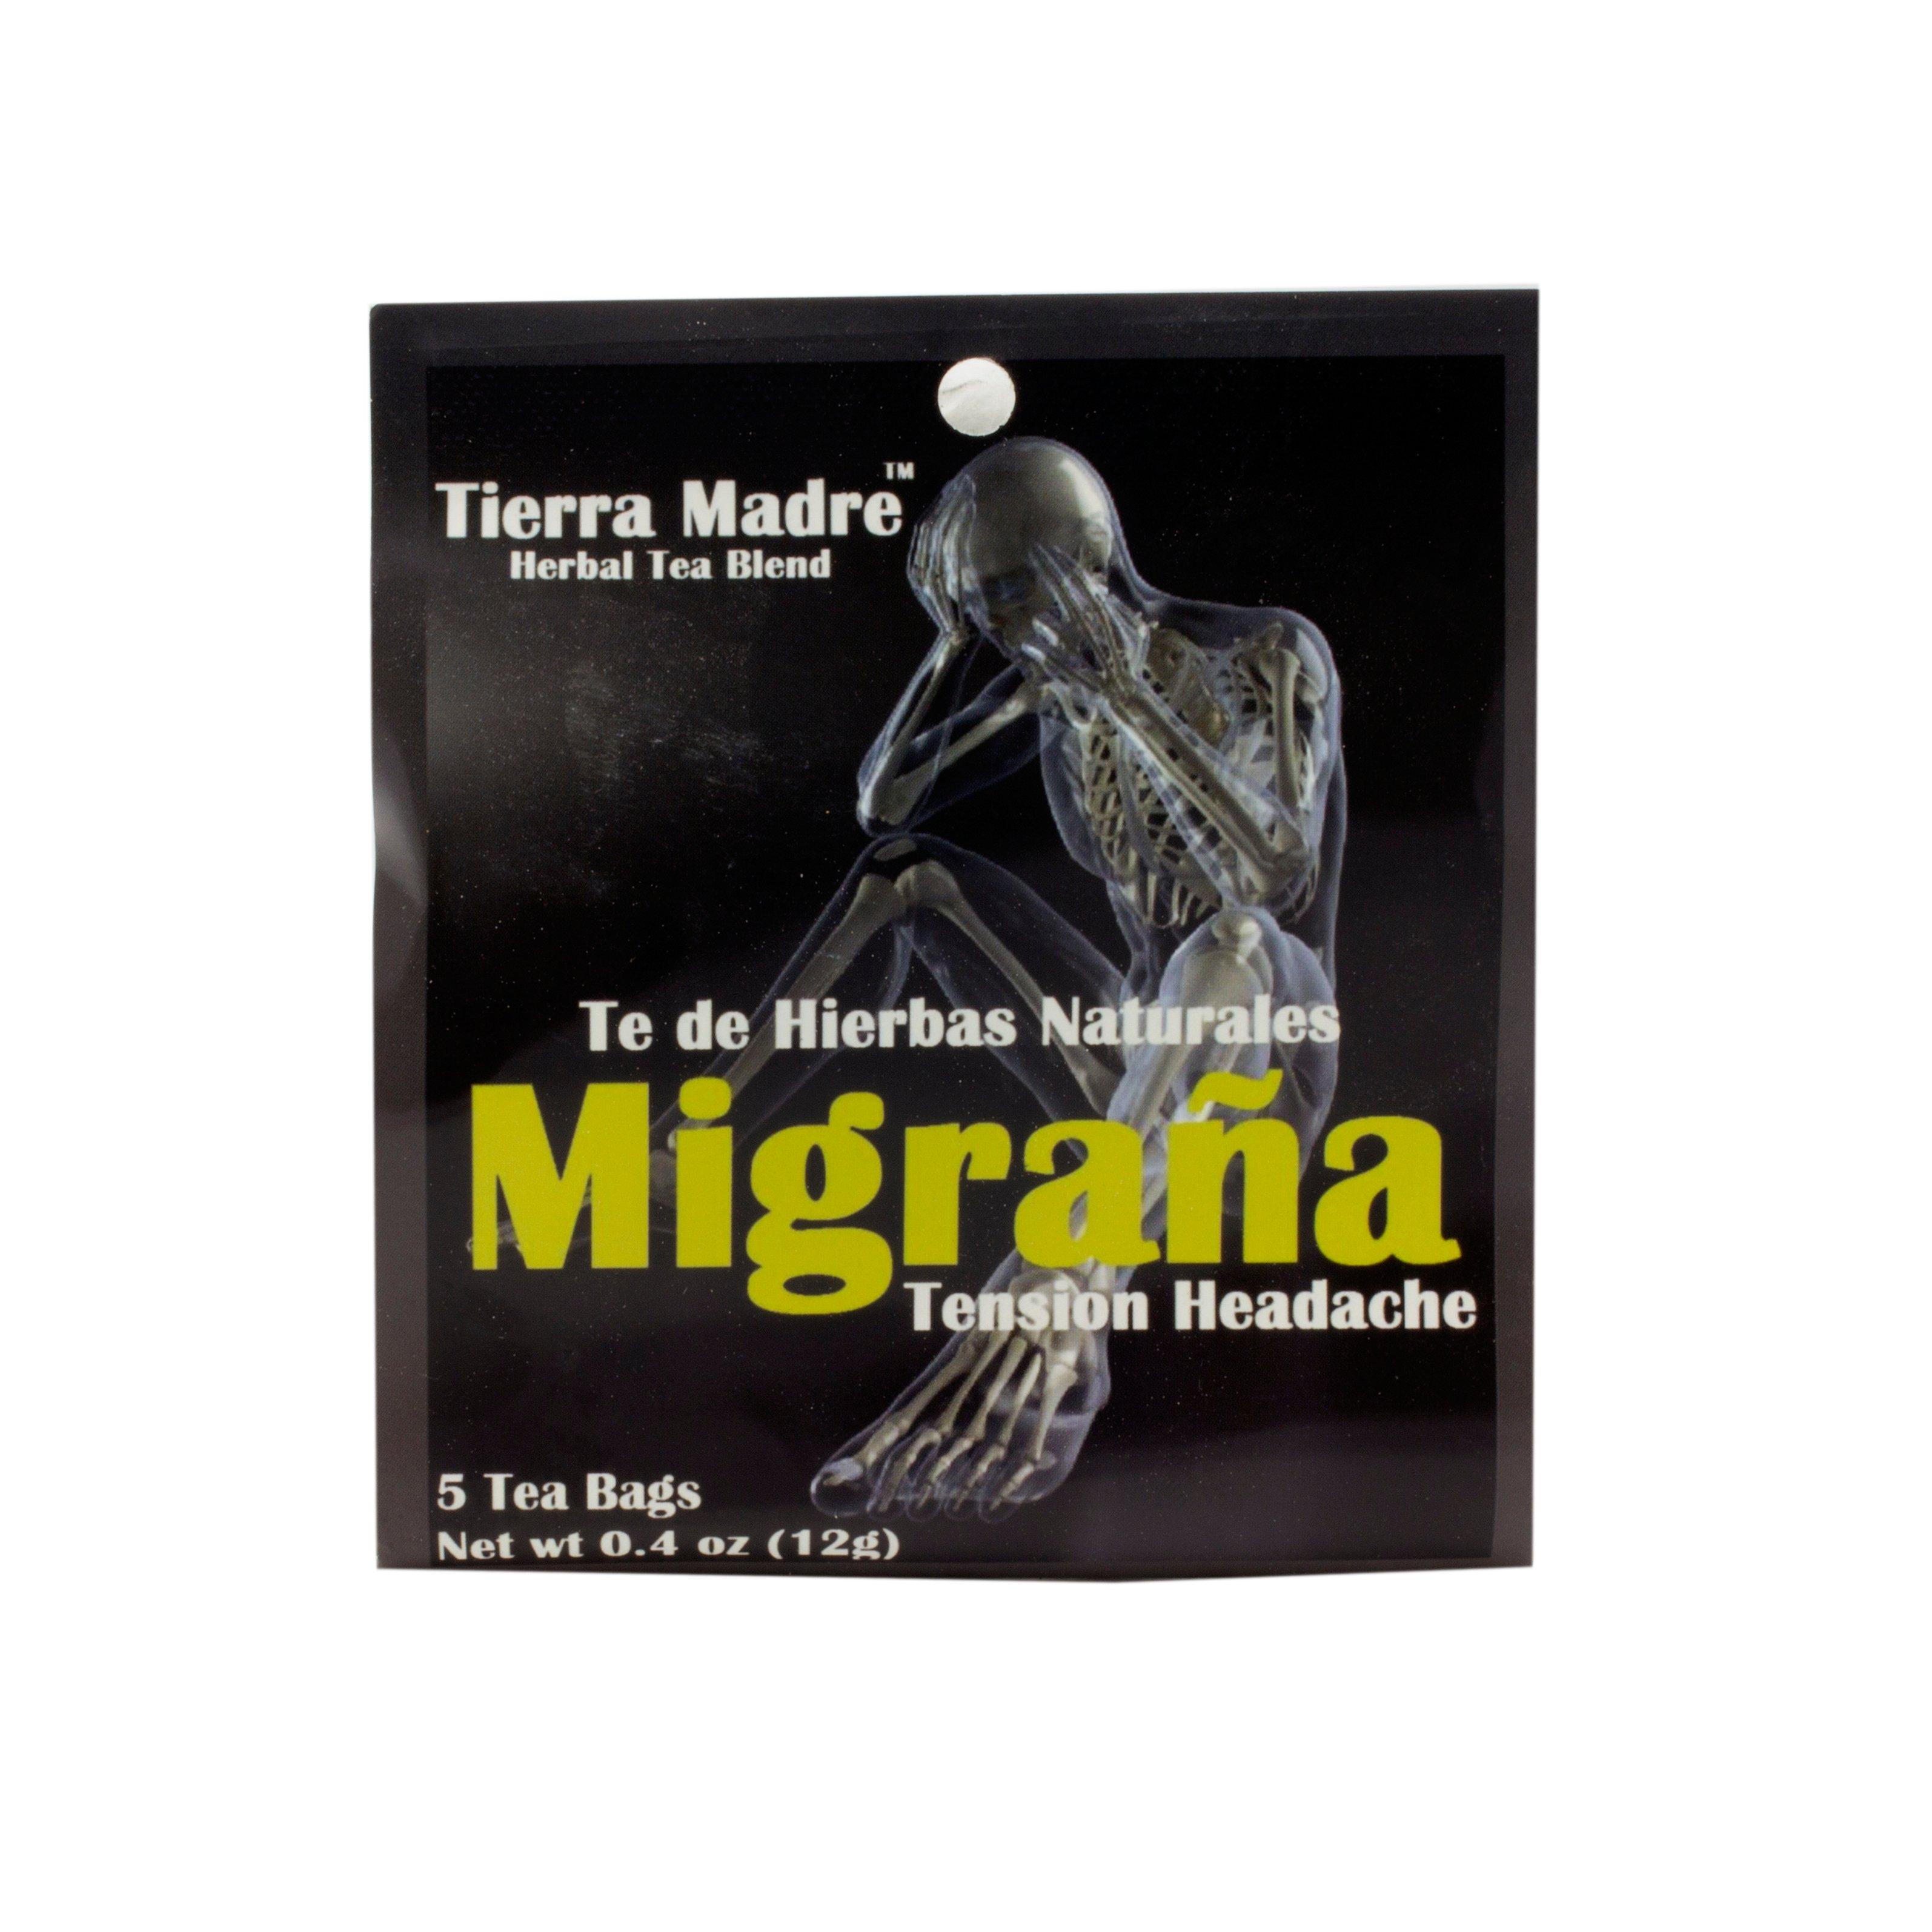 Tierra Madre Slim Tea Reviews - Tierra madre migrana tension headache herbal tea blend shop tea at heb